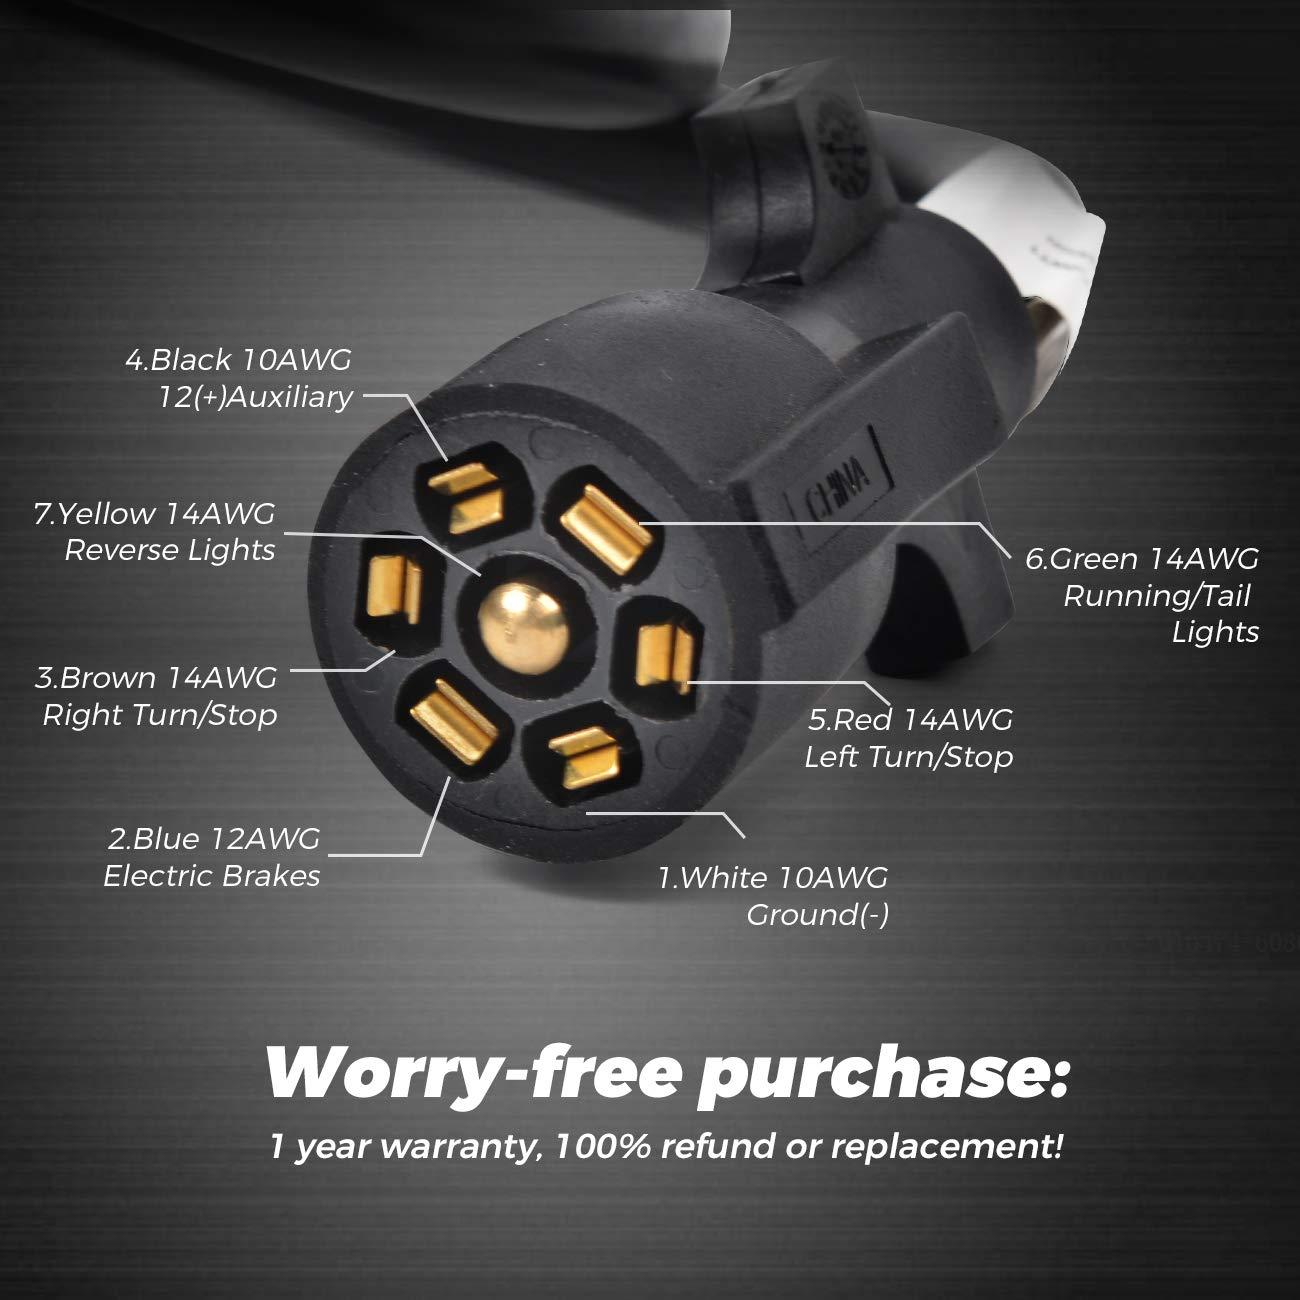 Hqap 29ft Heavy Duty 7 Way Plug Cord Inline Harness Kit 4 Ft Trailer Wiring